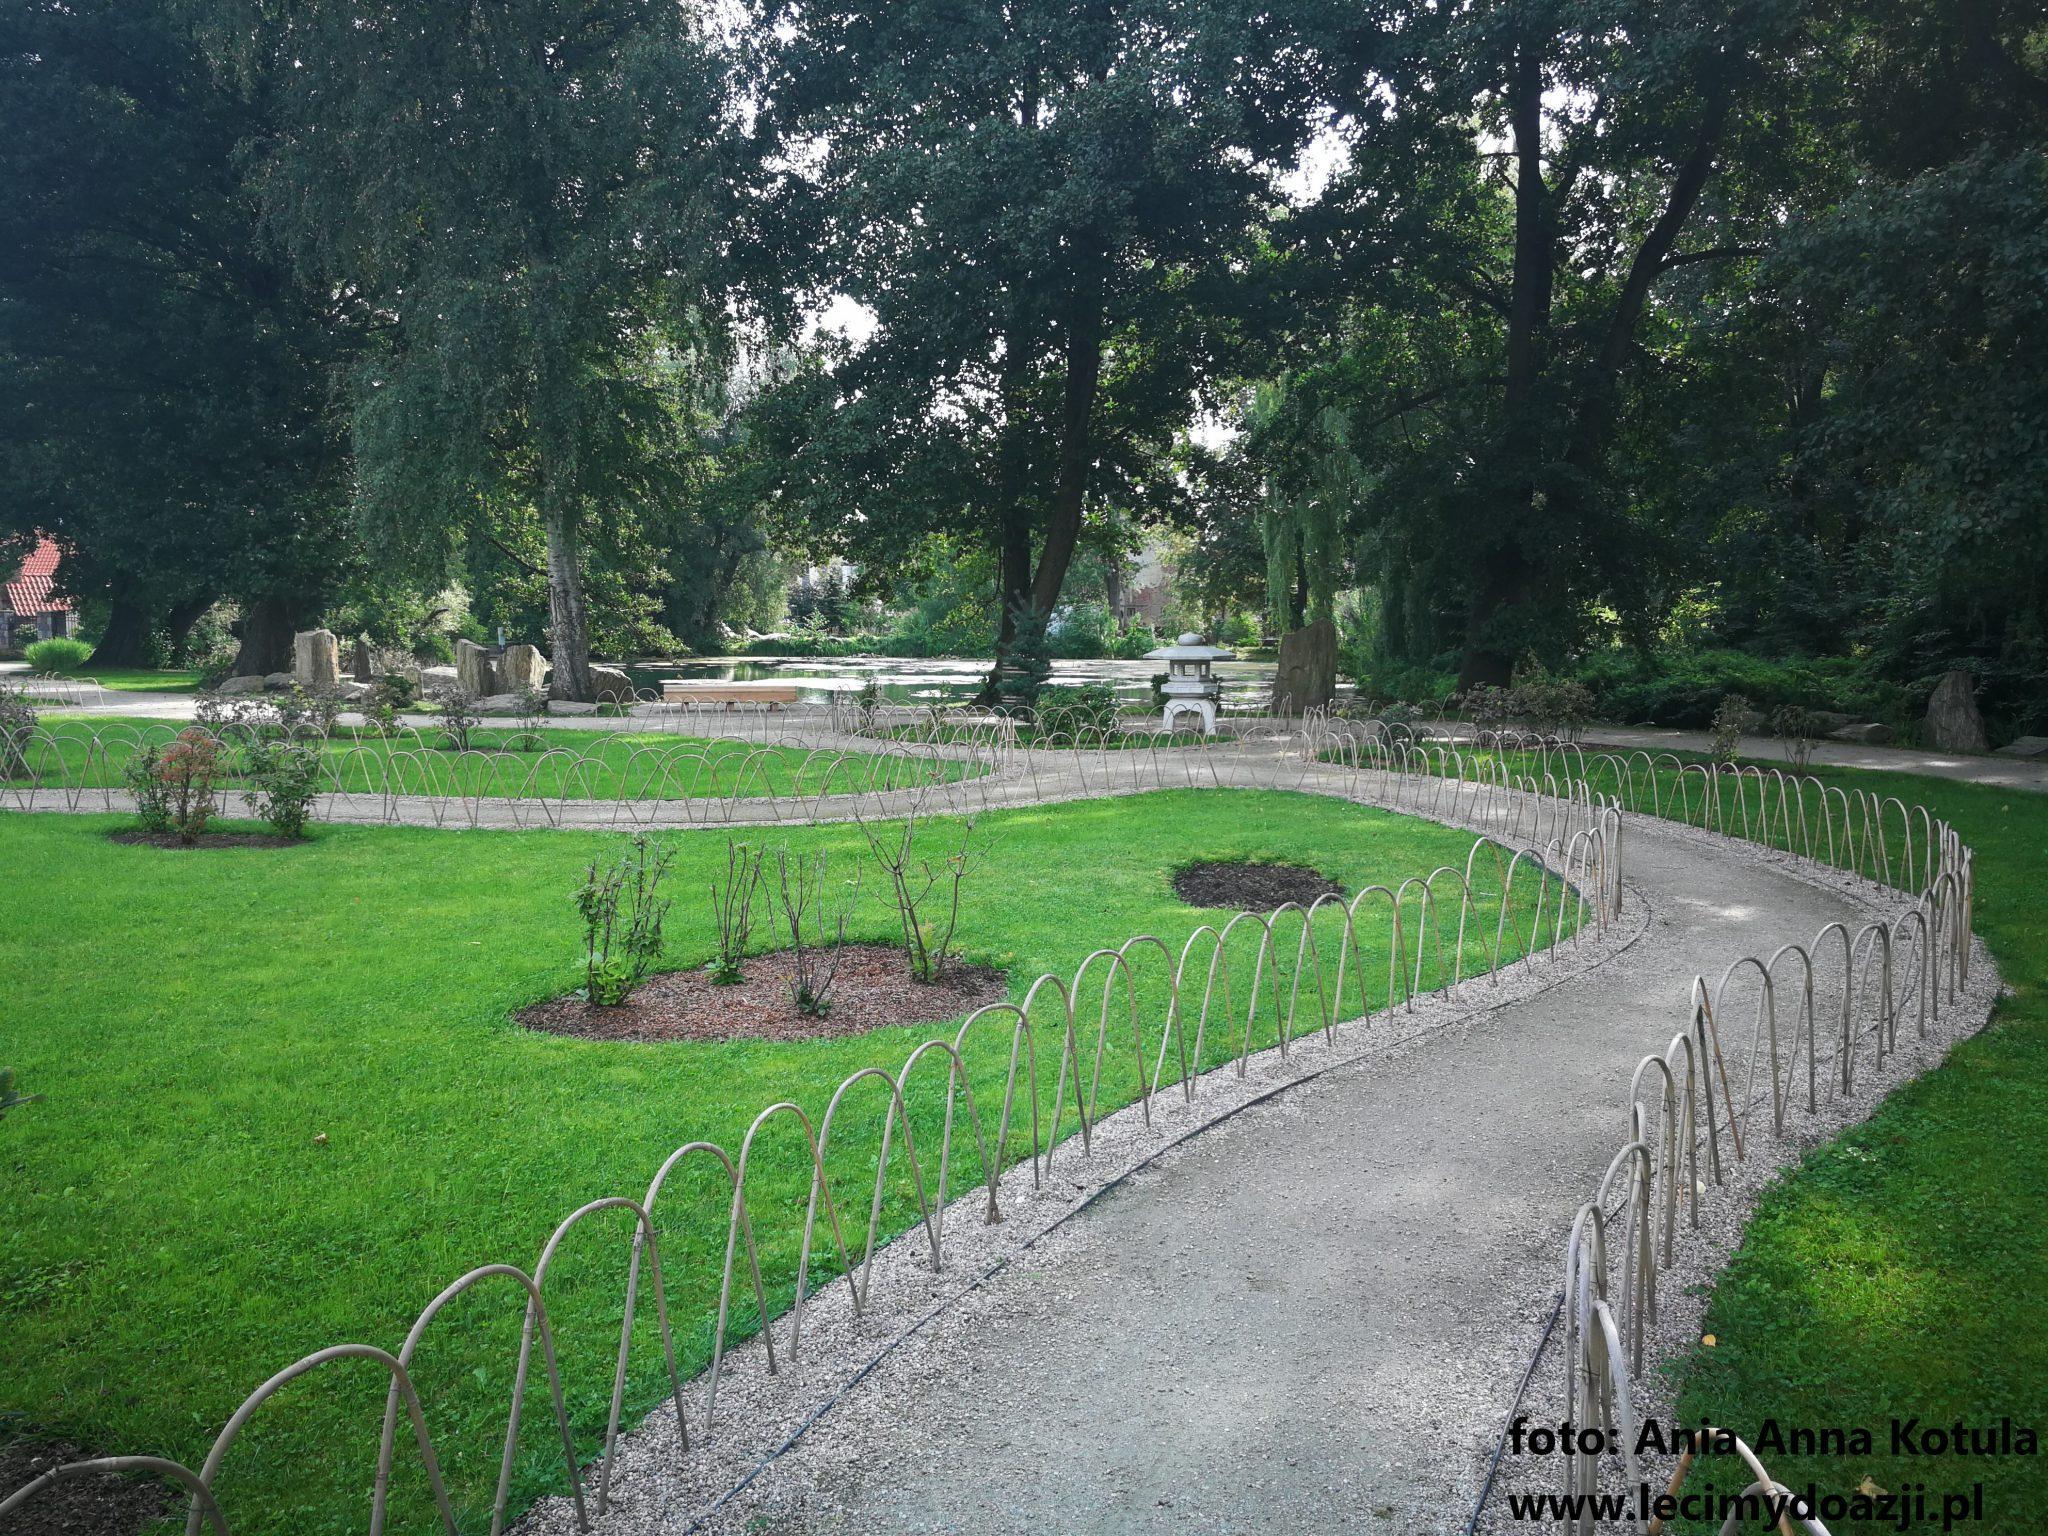 Ogrod Japonski, Park Oliwski w Gdańsku